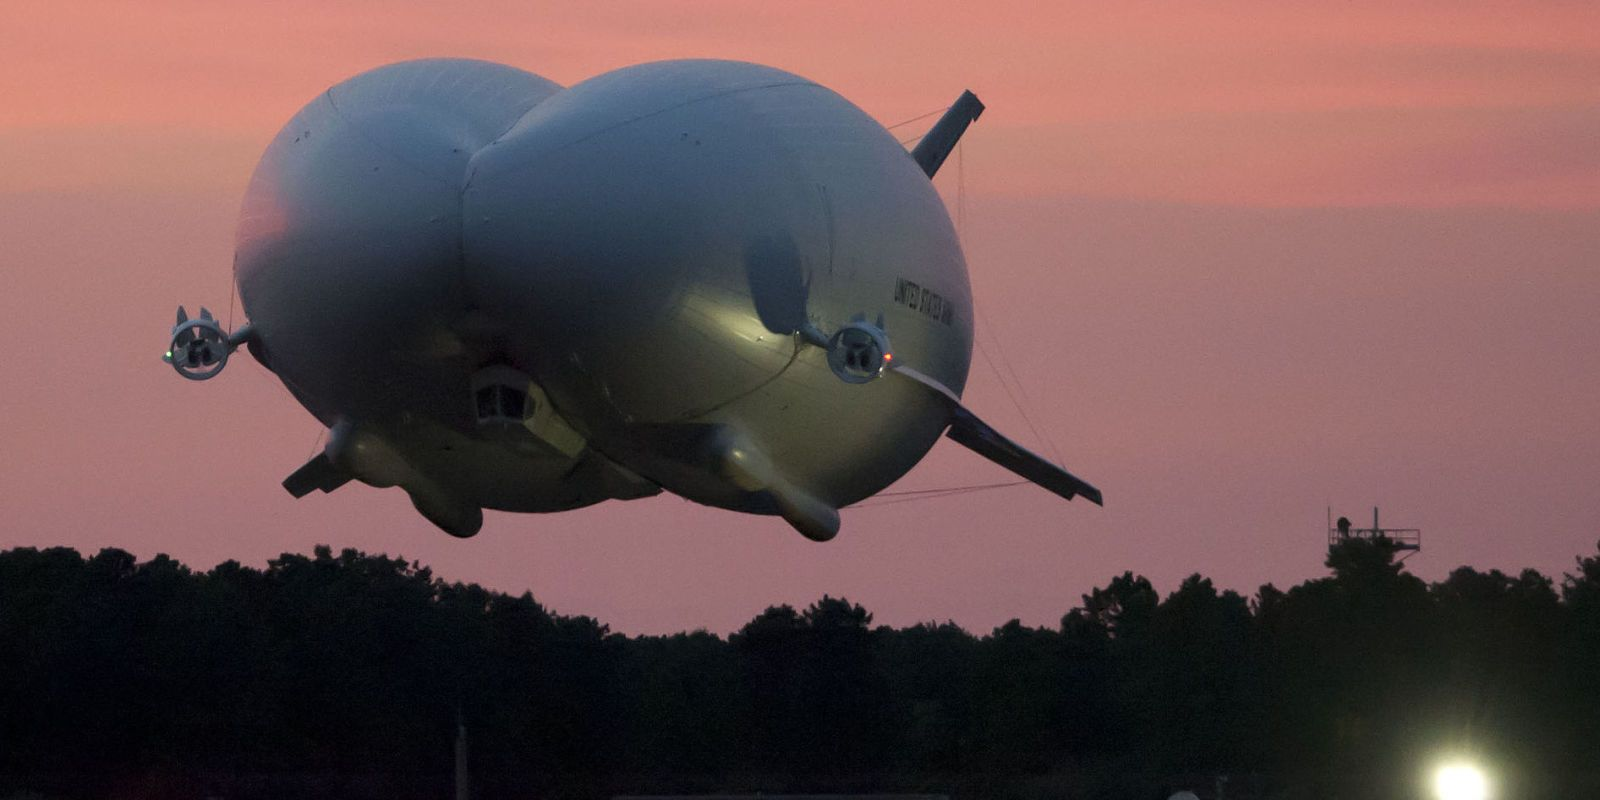 U.S. Army's New Battle Blimp Takes Flight